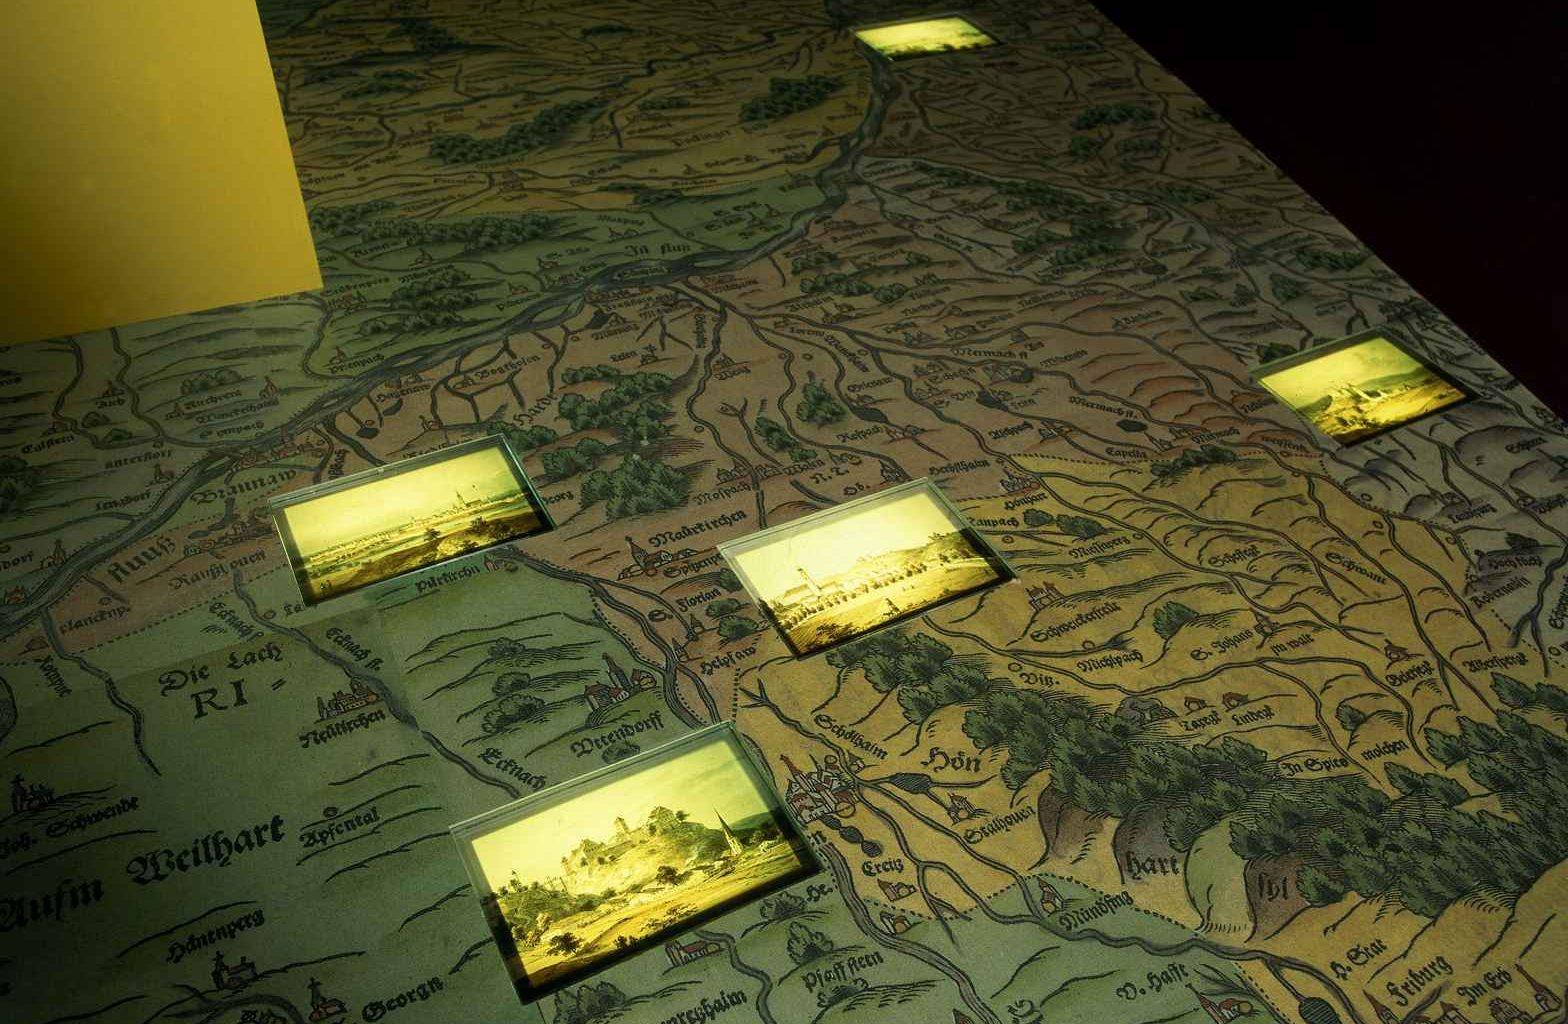 begehbare Landkarte